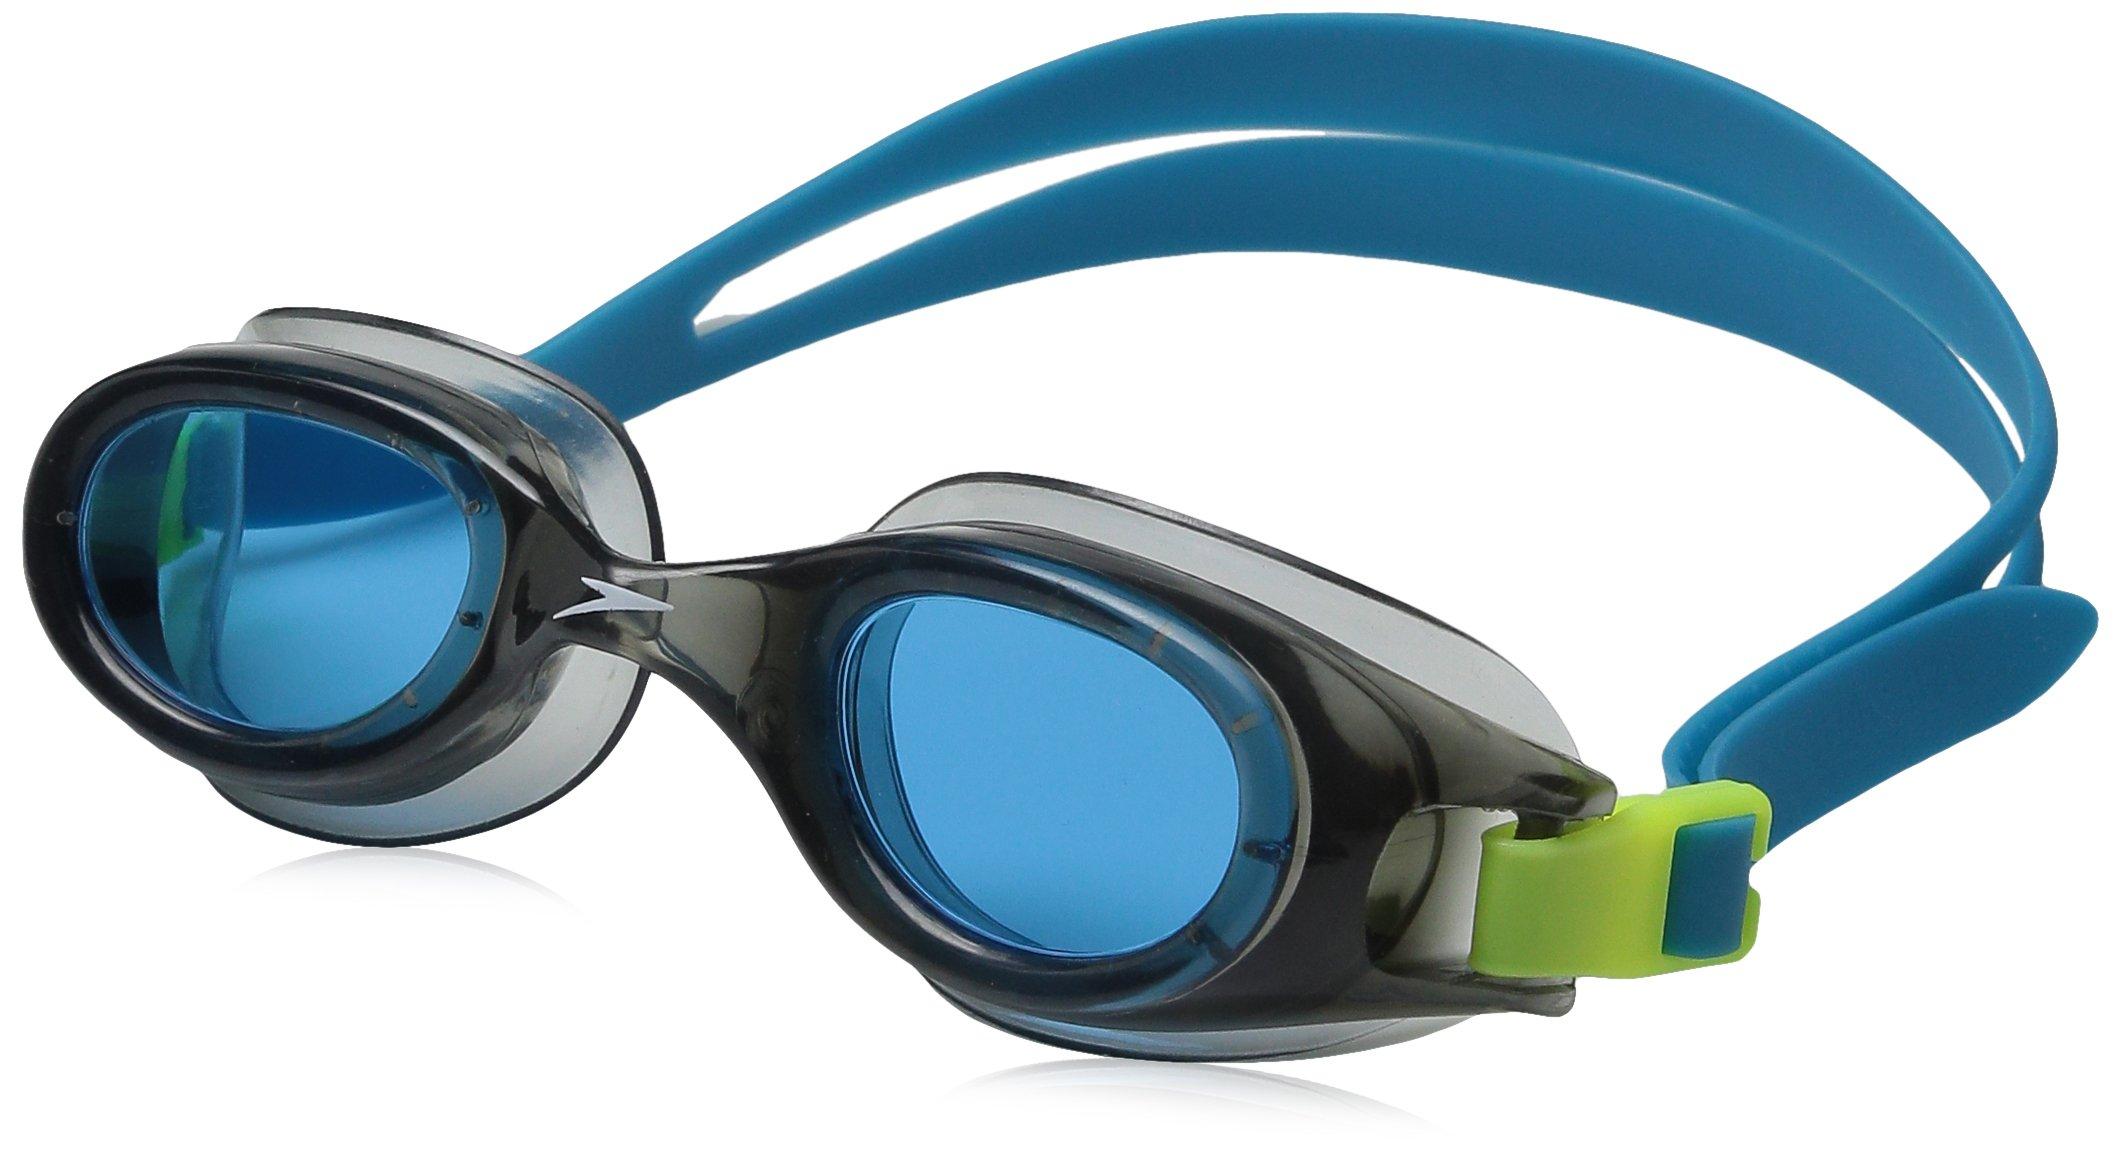 Speedo Jr. Hydrospex Classic Swim Goggles, No Leak, Anti-Fog, and Easy to Adjust with UV Protection, Grey/Blue, 1SZ